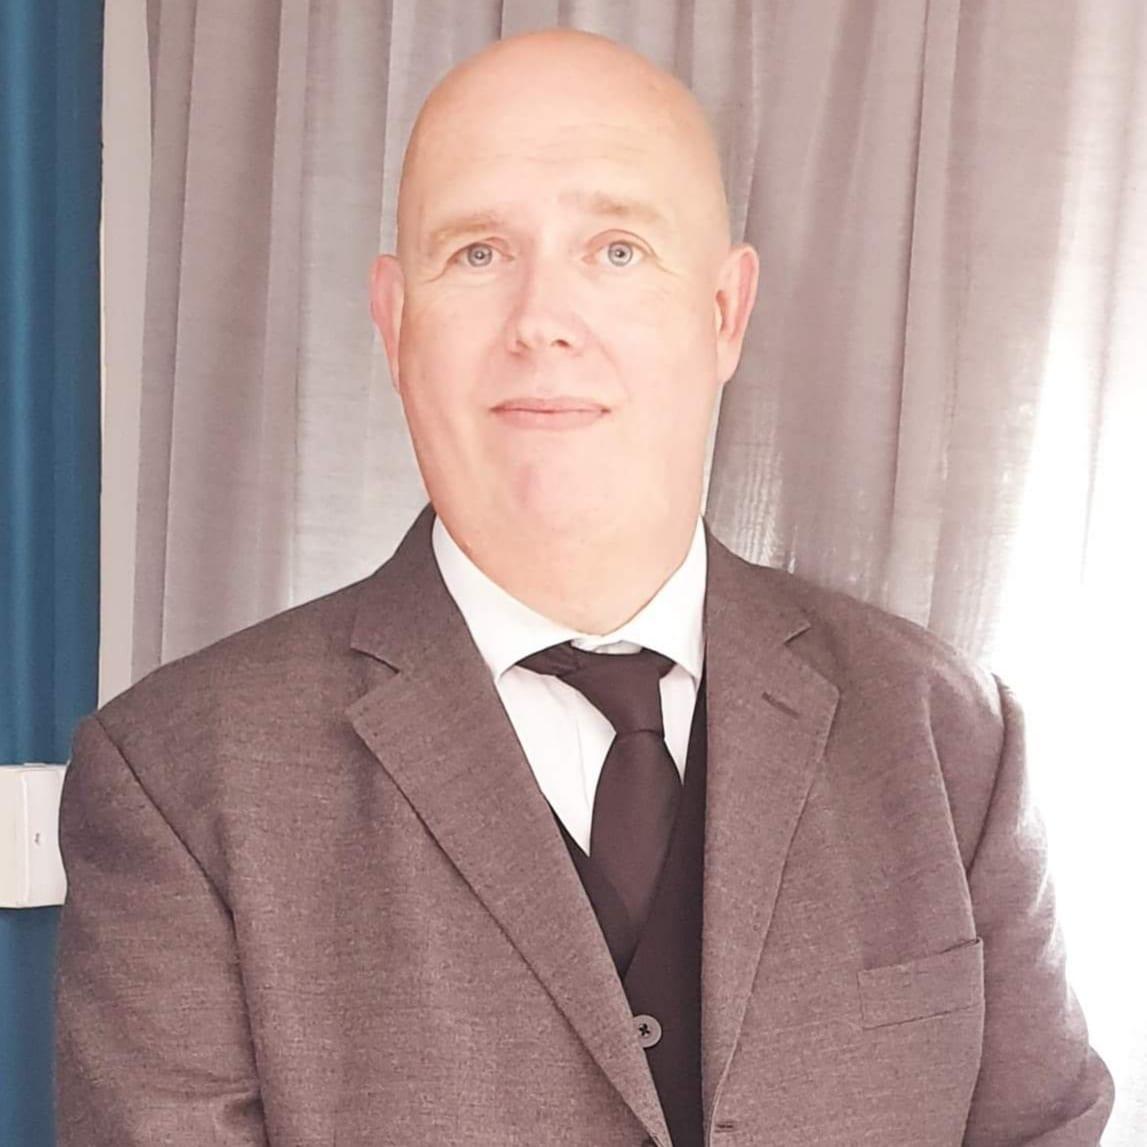 Martin Keightley